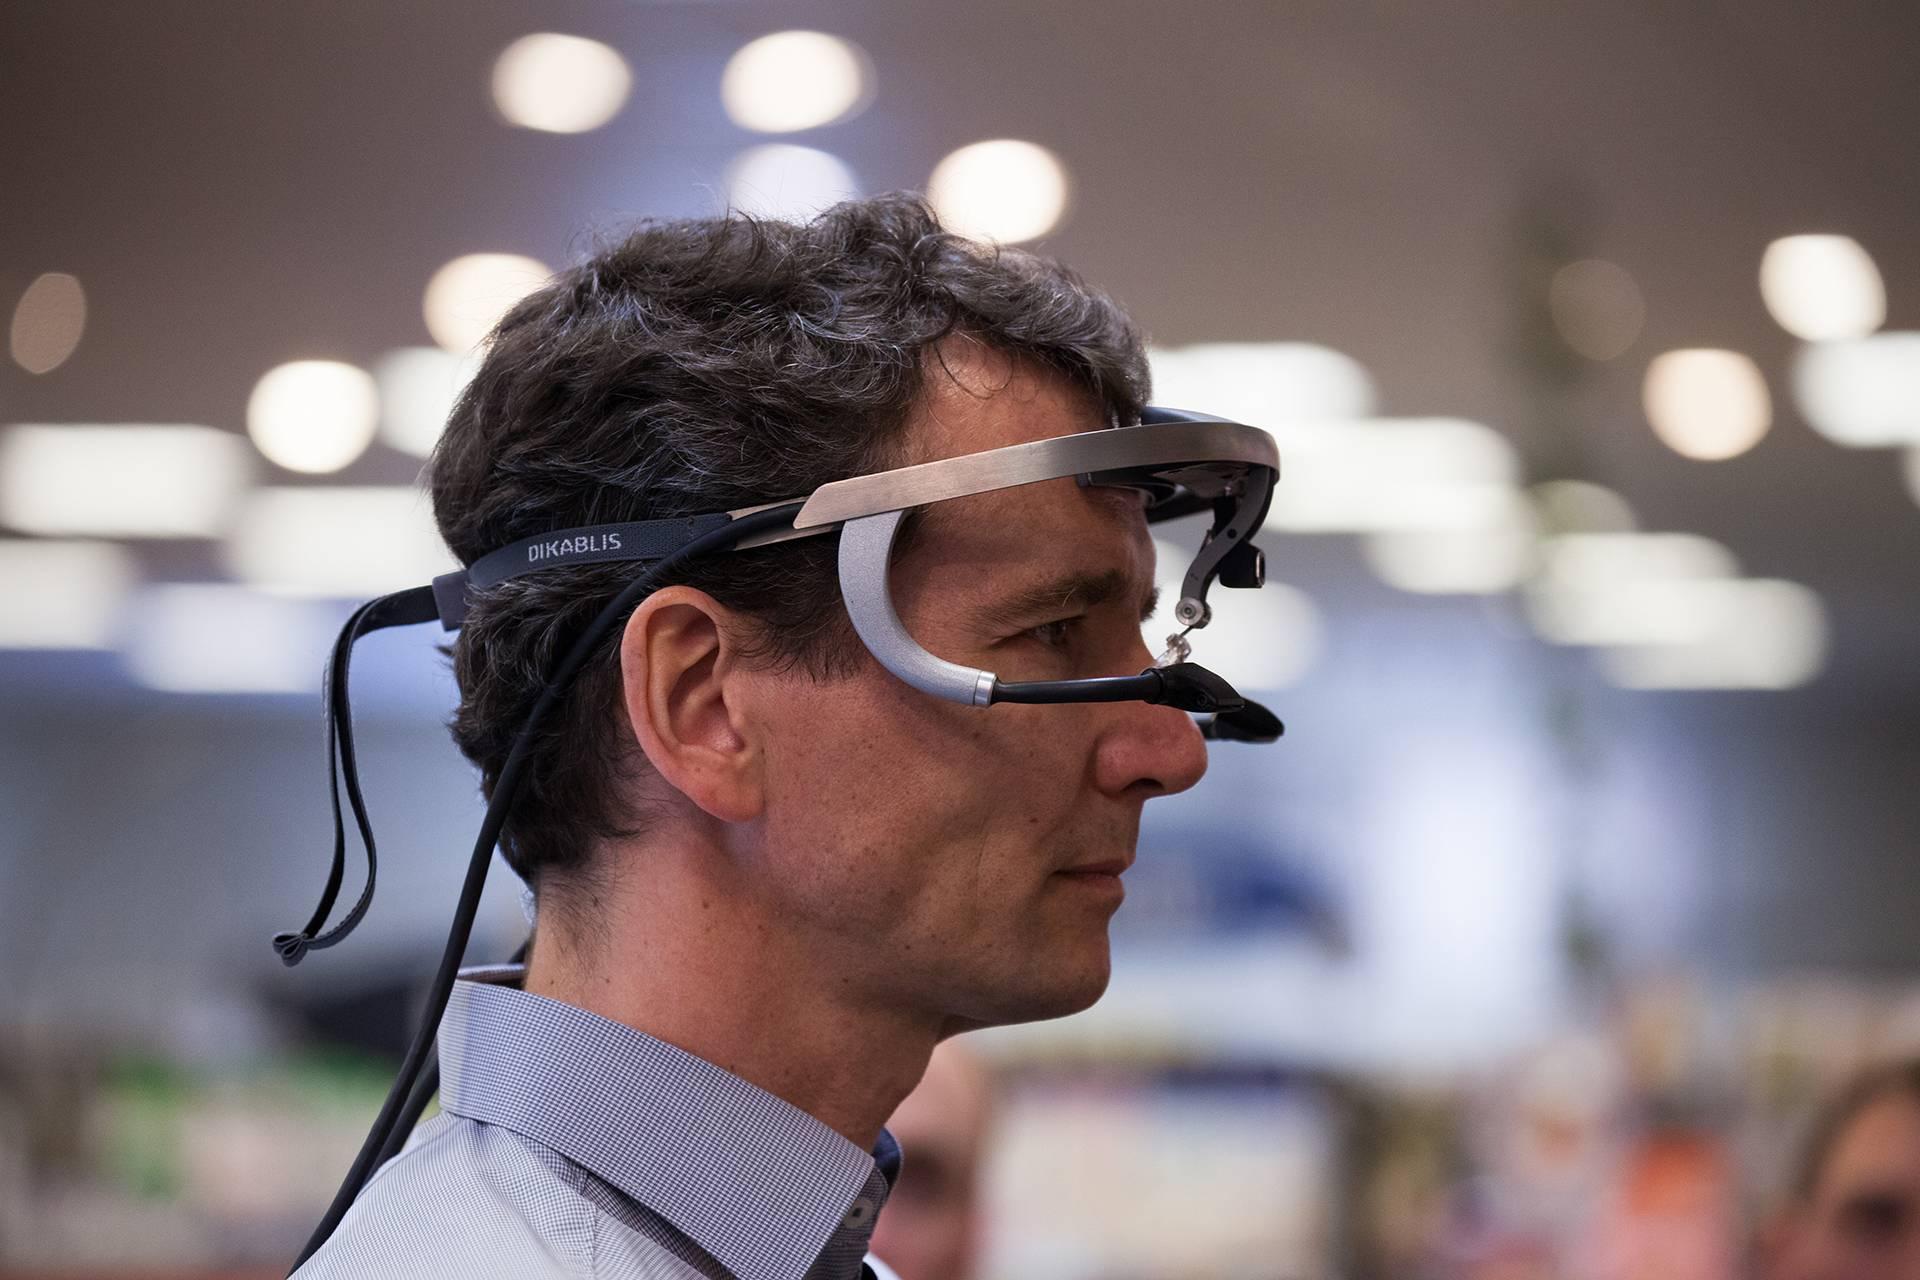 Forschung - Multisensorik - Creative Technology - POS - Supermarkt - Gesture Tracking - Emotion Tracking - Biomotion - realtime visions